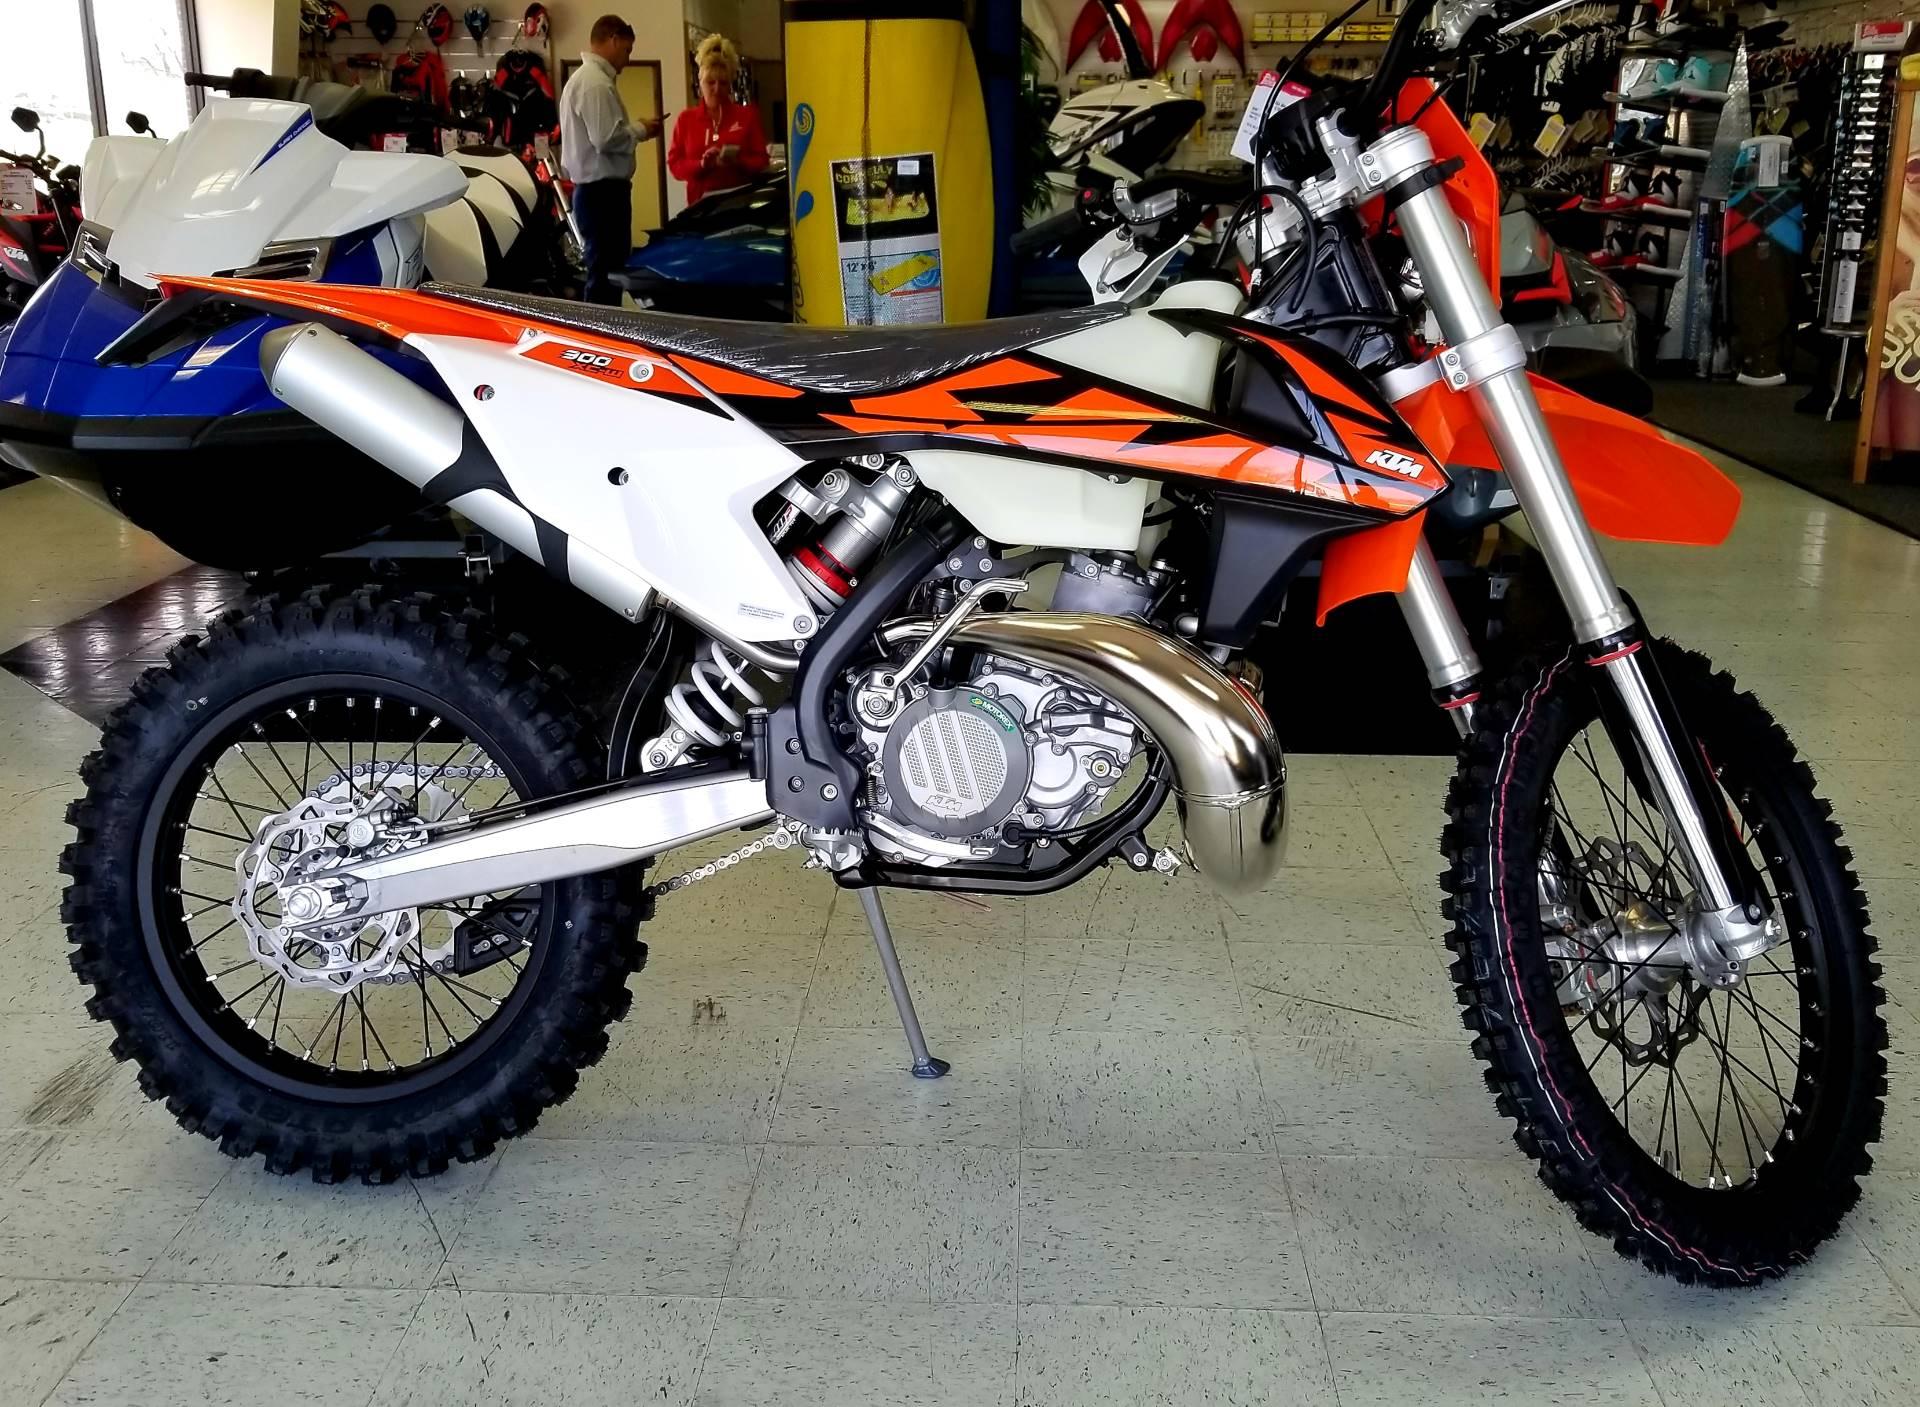 2018 ktm 300 xc w motorcycles afton oklahoma ktm313995 2018 ktm 300 xc w in afton oklahoma ccuart Image collections